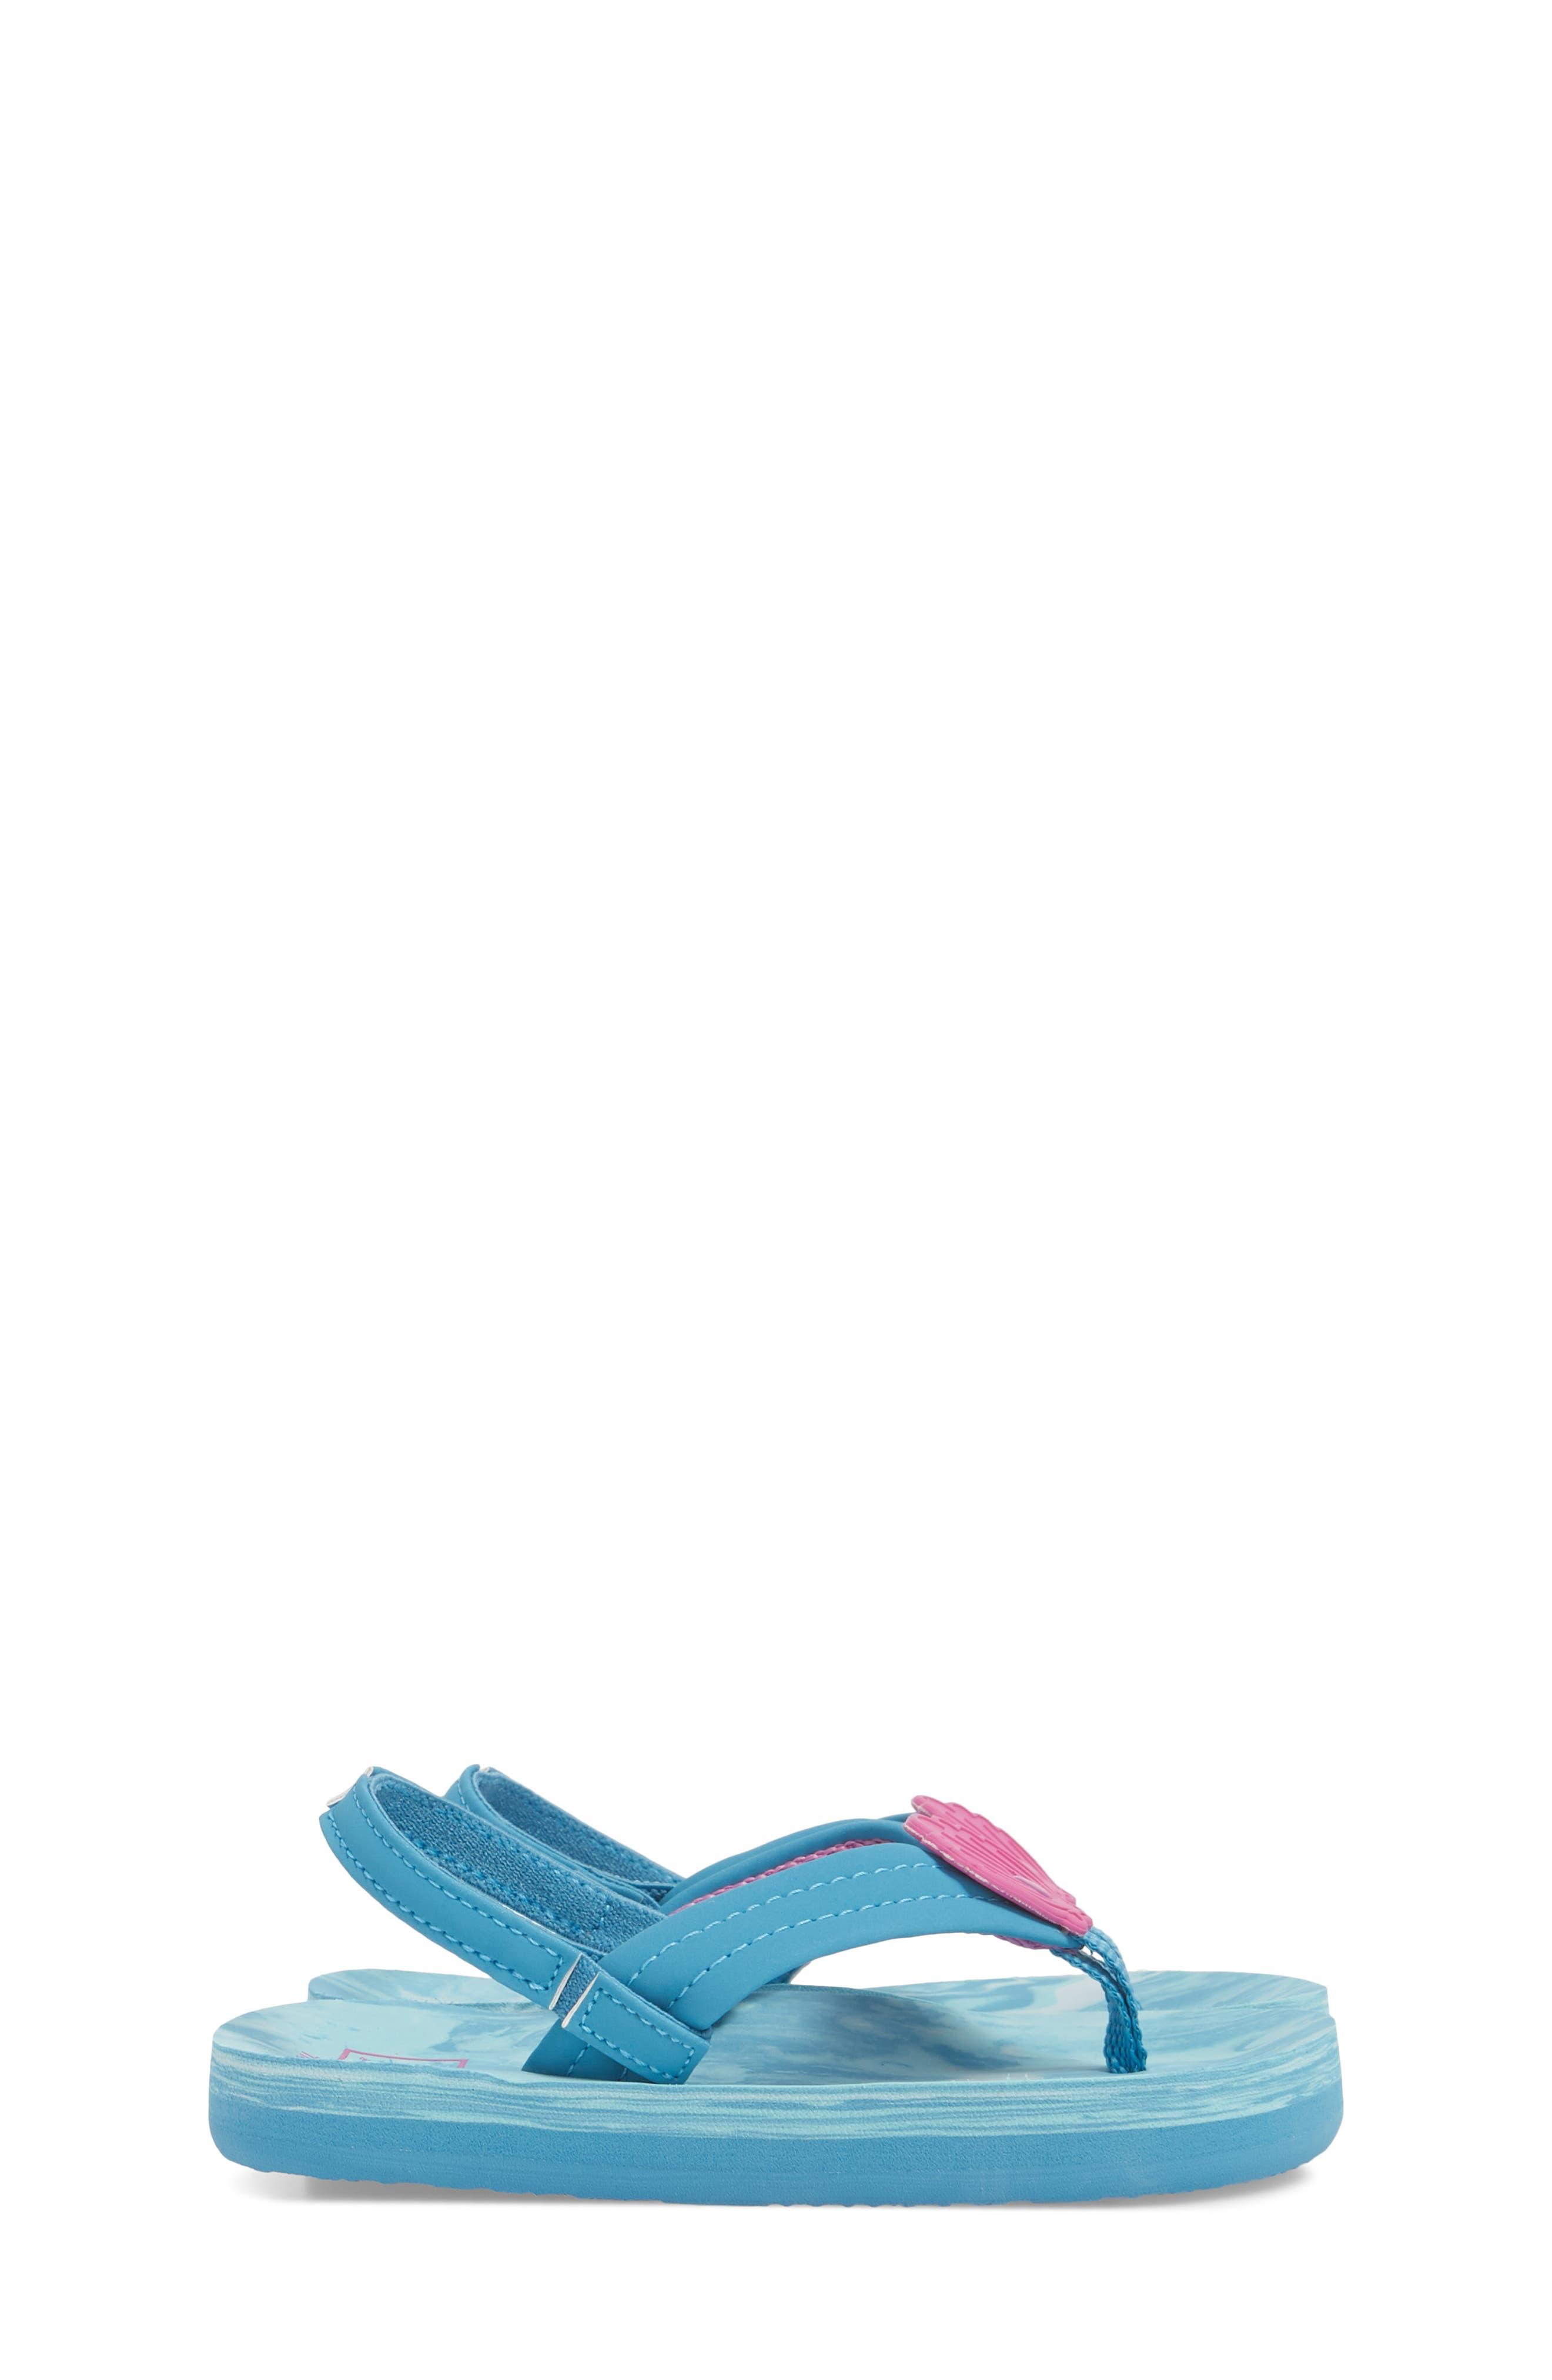 Little Ahi Swirl Flip Flop,                             Alternate thumbnail 4, color,                             423